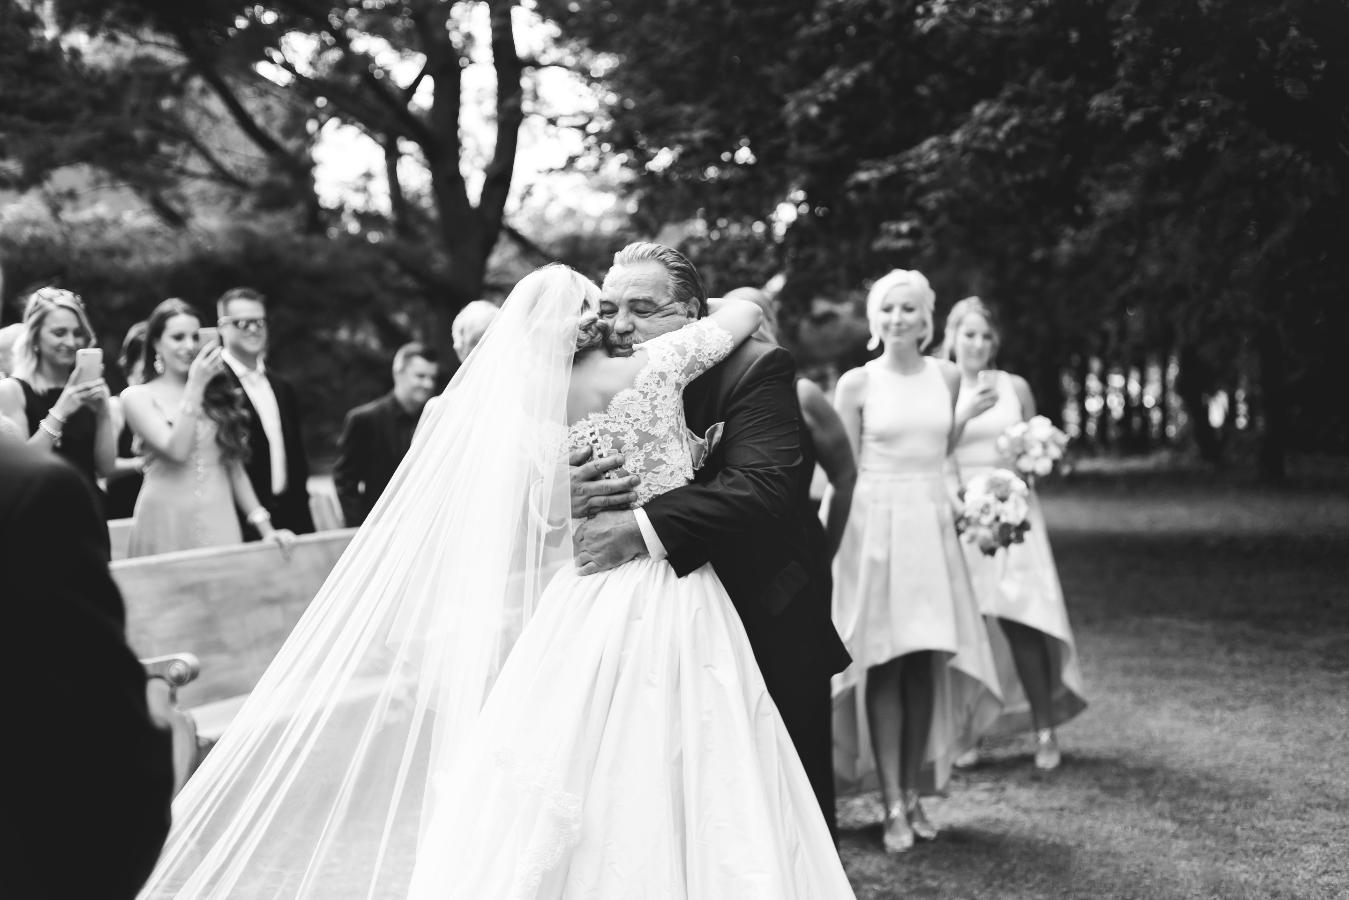 Moments-by-Lauren-Hamilton-Toronto-Niagara-Wedding-Photographer-Genuine-Emotional-Images-Photo-8.png